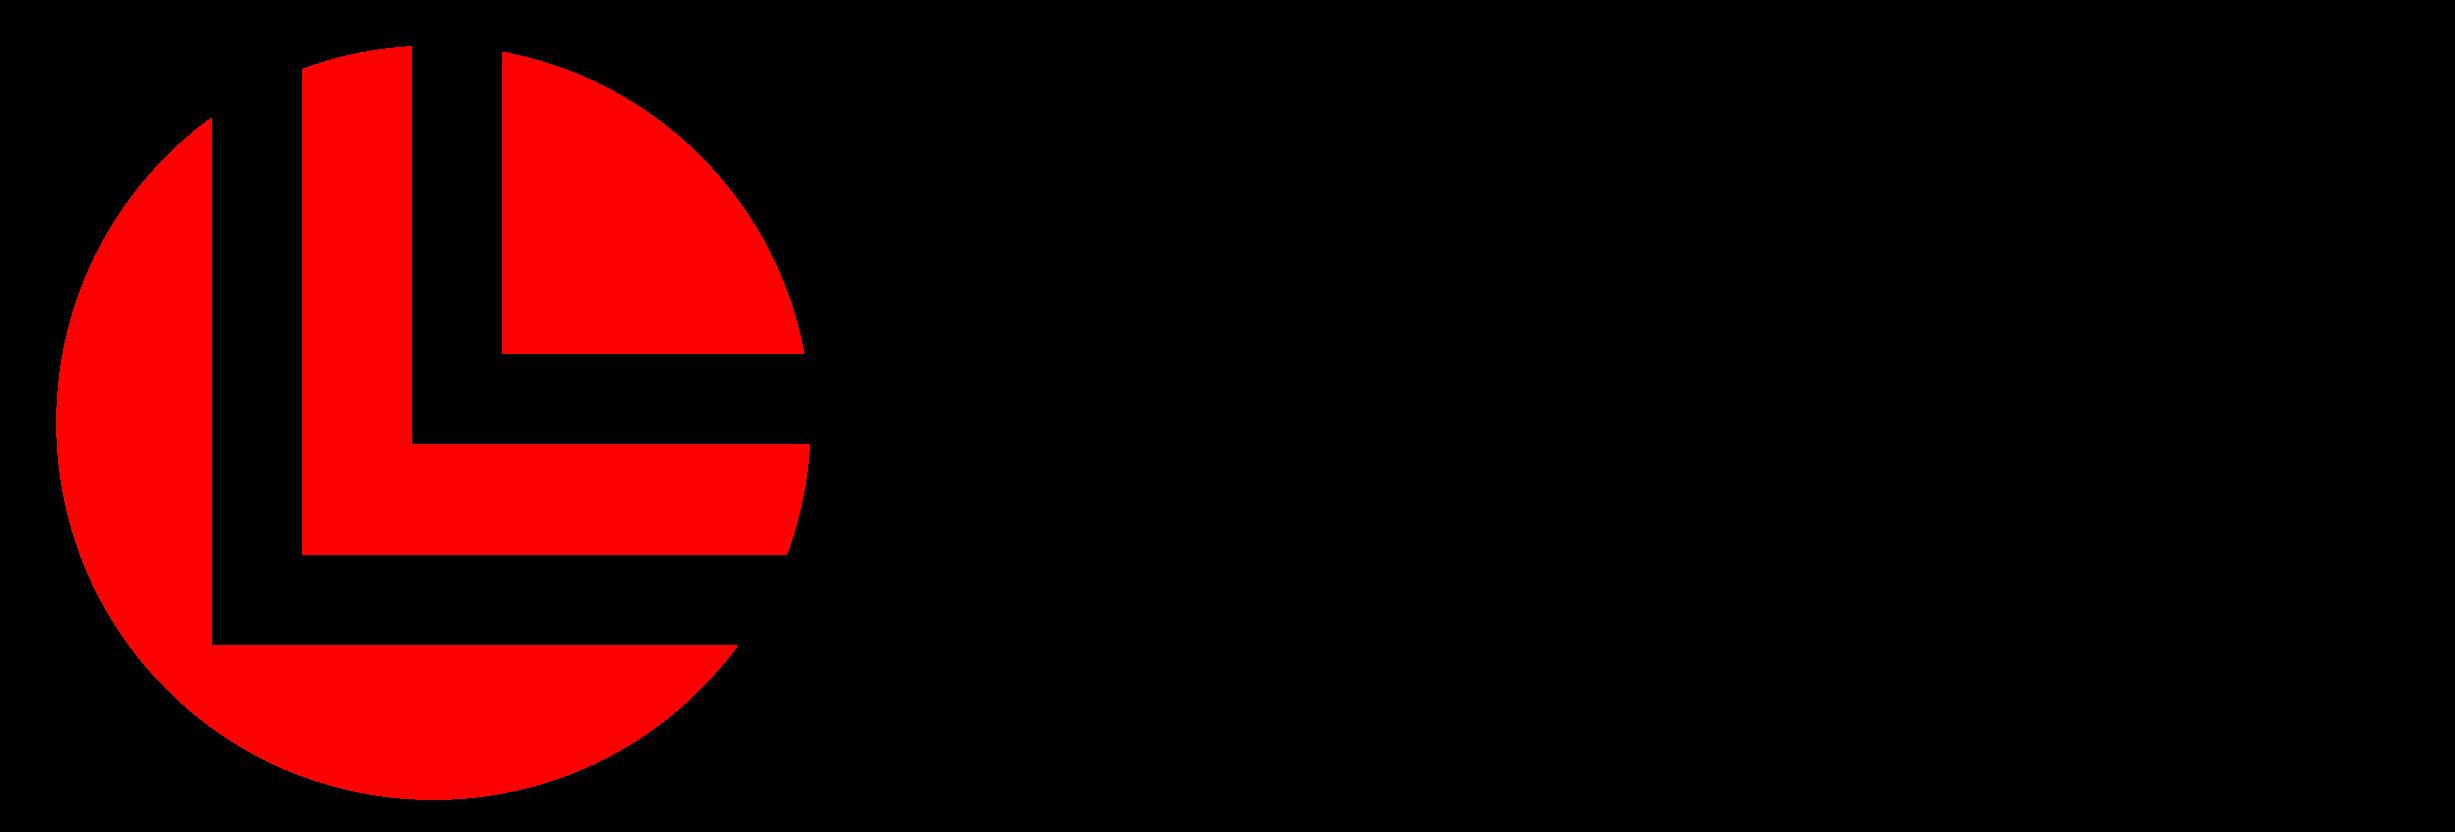 LabeLive Logo - 300 ppi